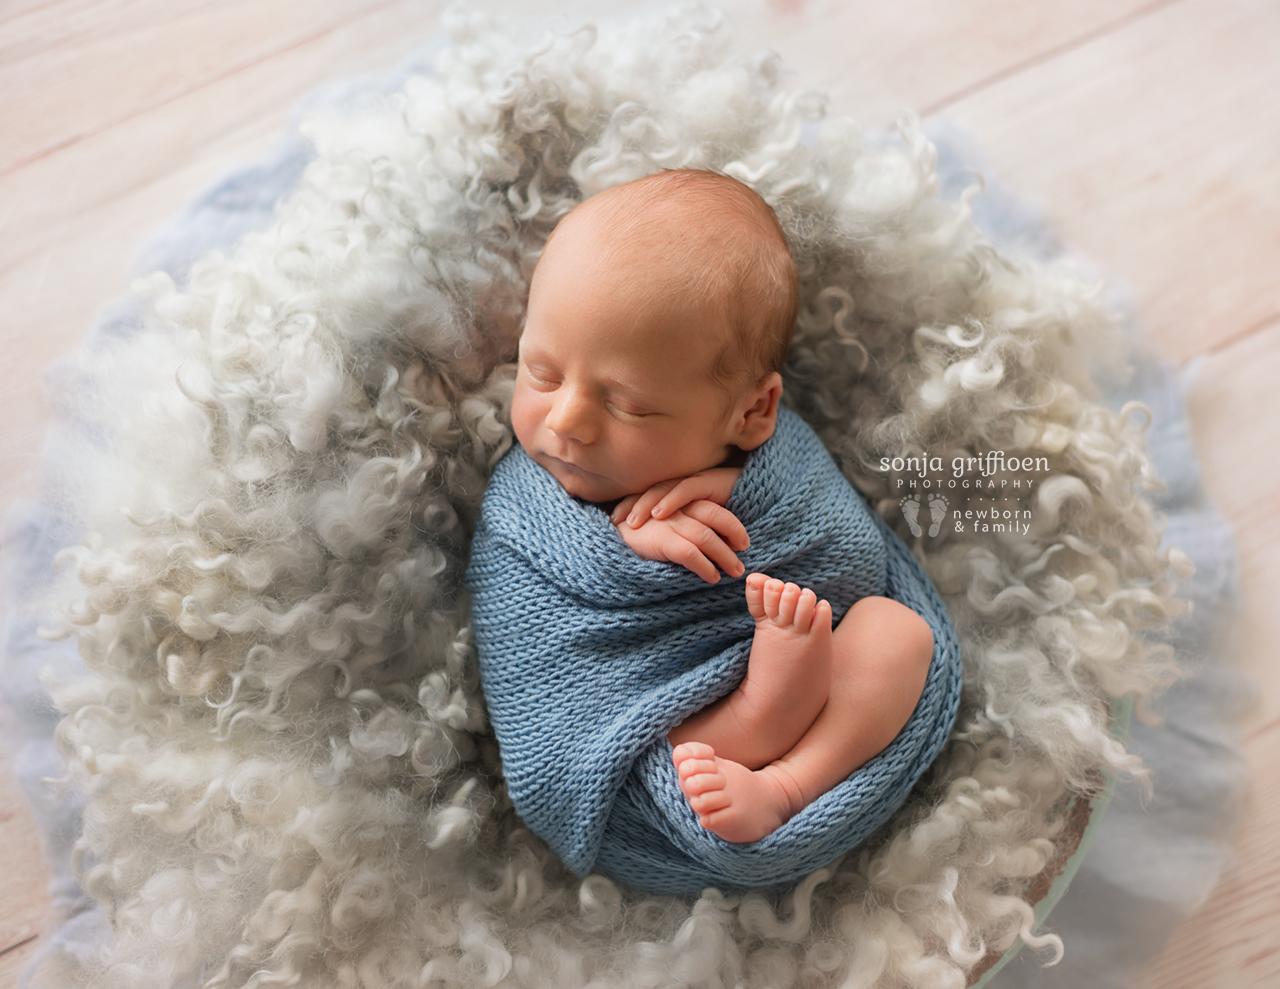 Louis-Newborn-Brisbane-Newborn-Photographer-Sonja-Griffioen-06.jpg